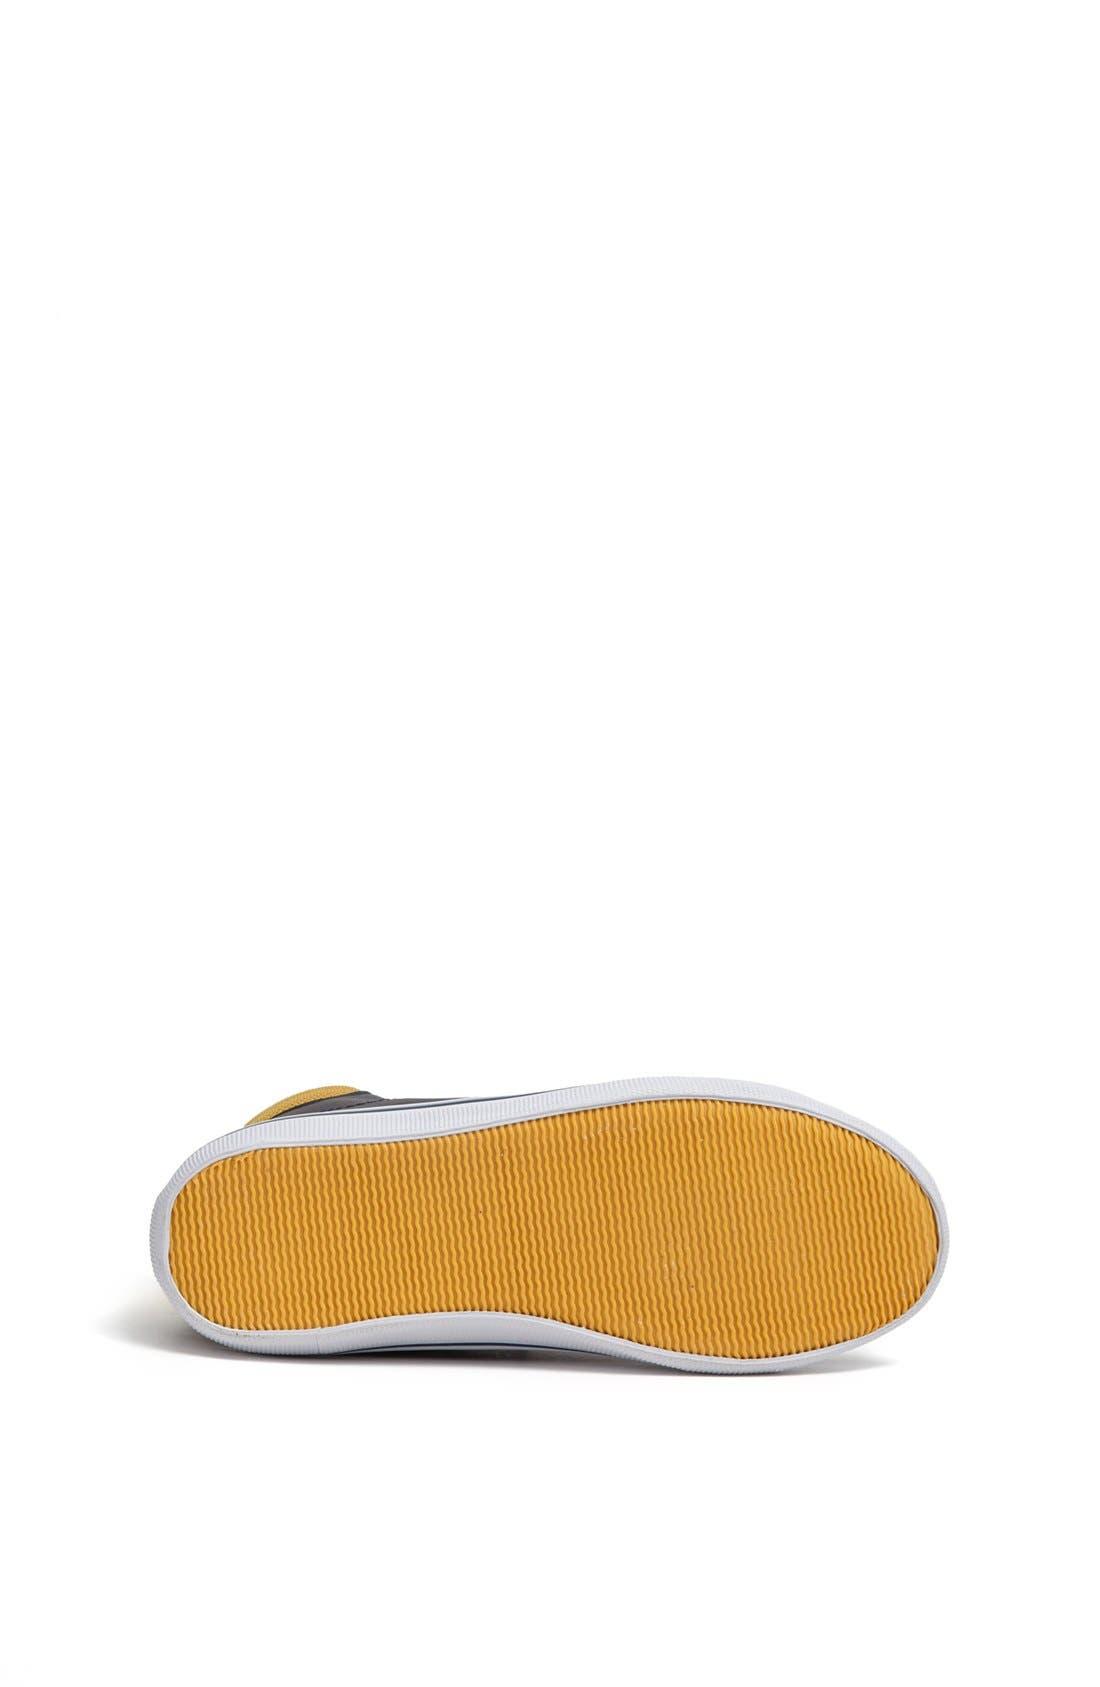 Alternate Image 4  - Lacoste 'Marcel' Sneaker (Baby, Walker, Toddler, Little Kid & Big Kid)